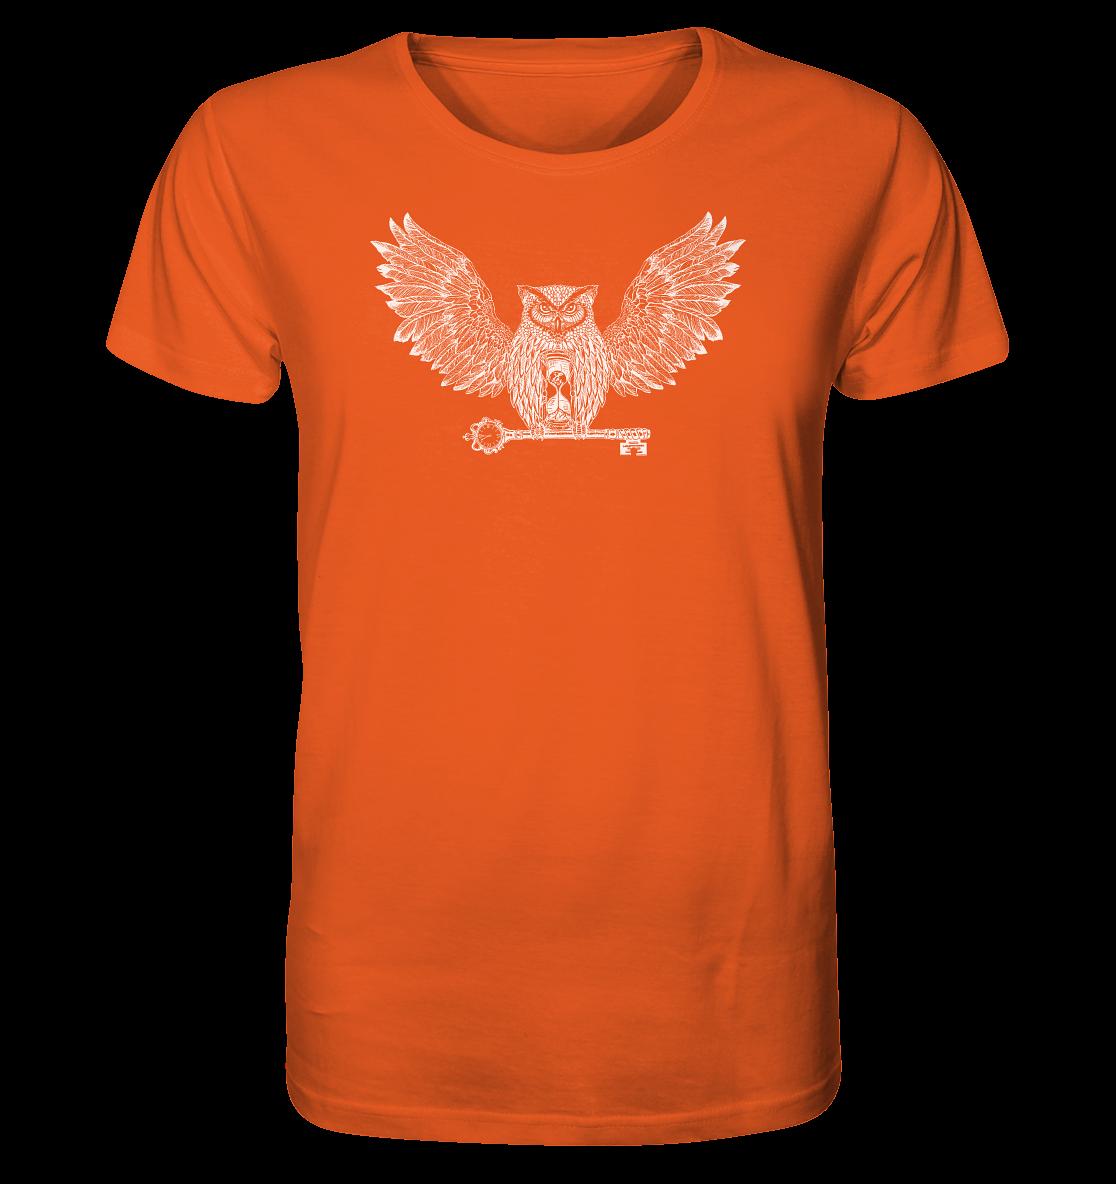 front-organic-shirt-ea5b23-1116x-8.png